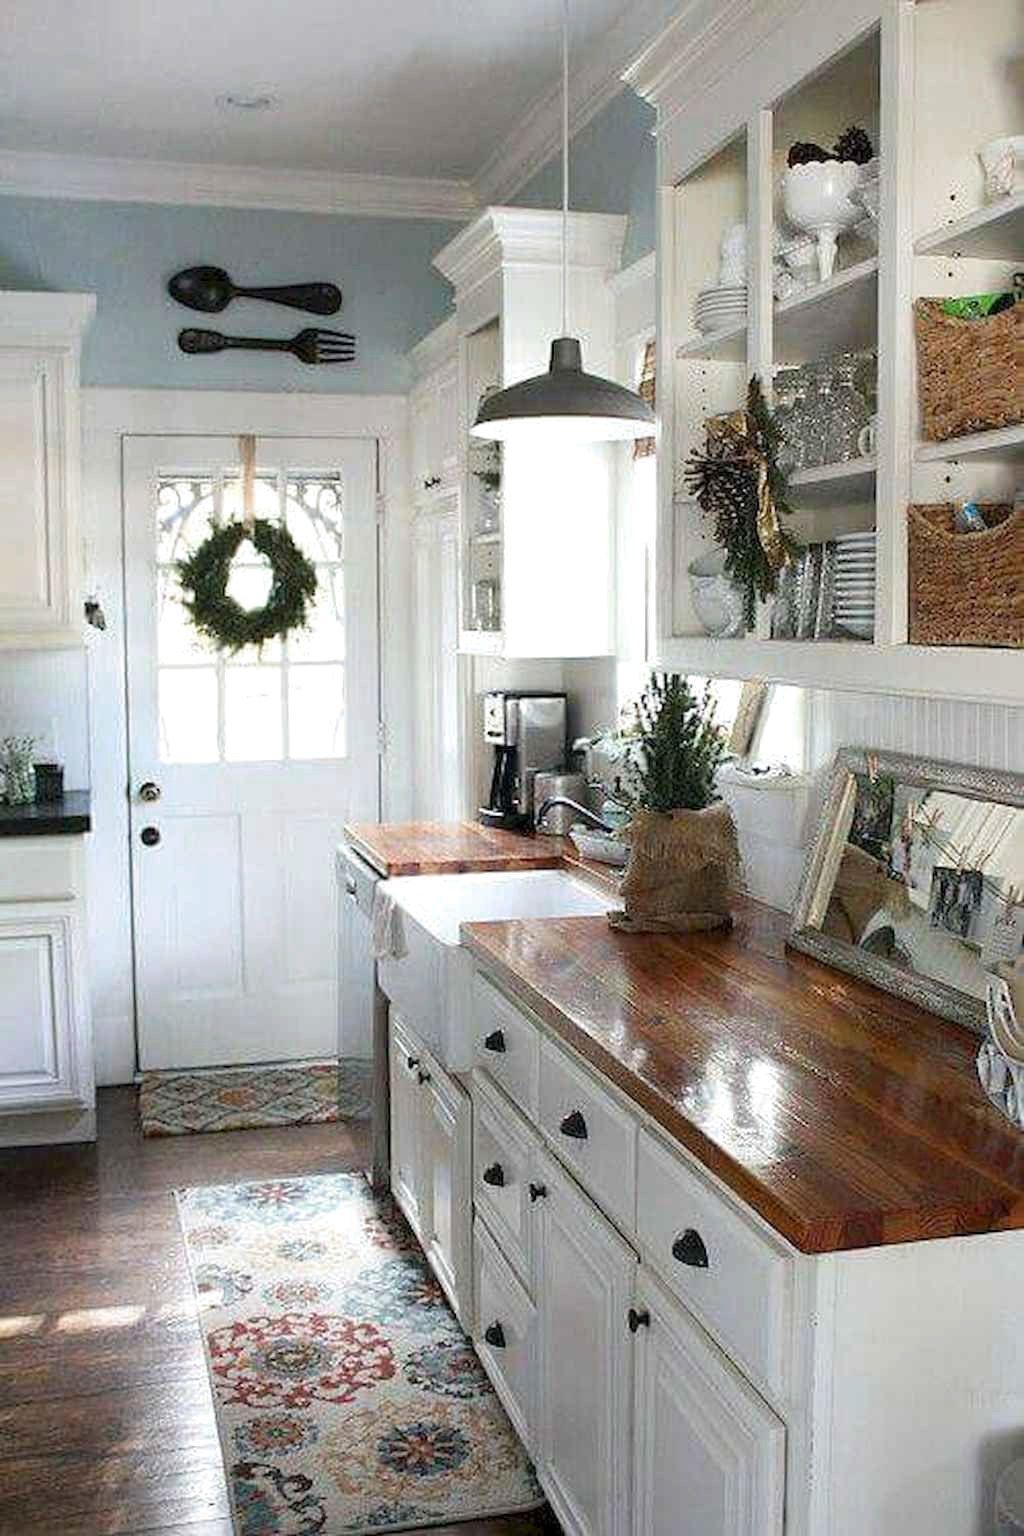 ✔67 Amazing Farmhouse Kitchen Cabinet Design Ideas #AmazingFarmhouseKitchenCabinetDesignIdeas